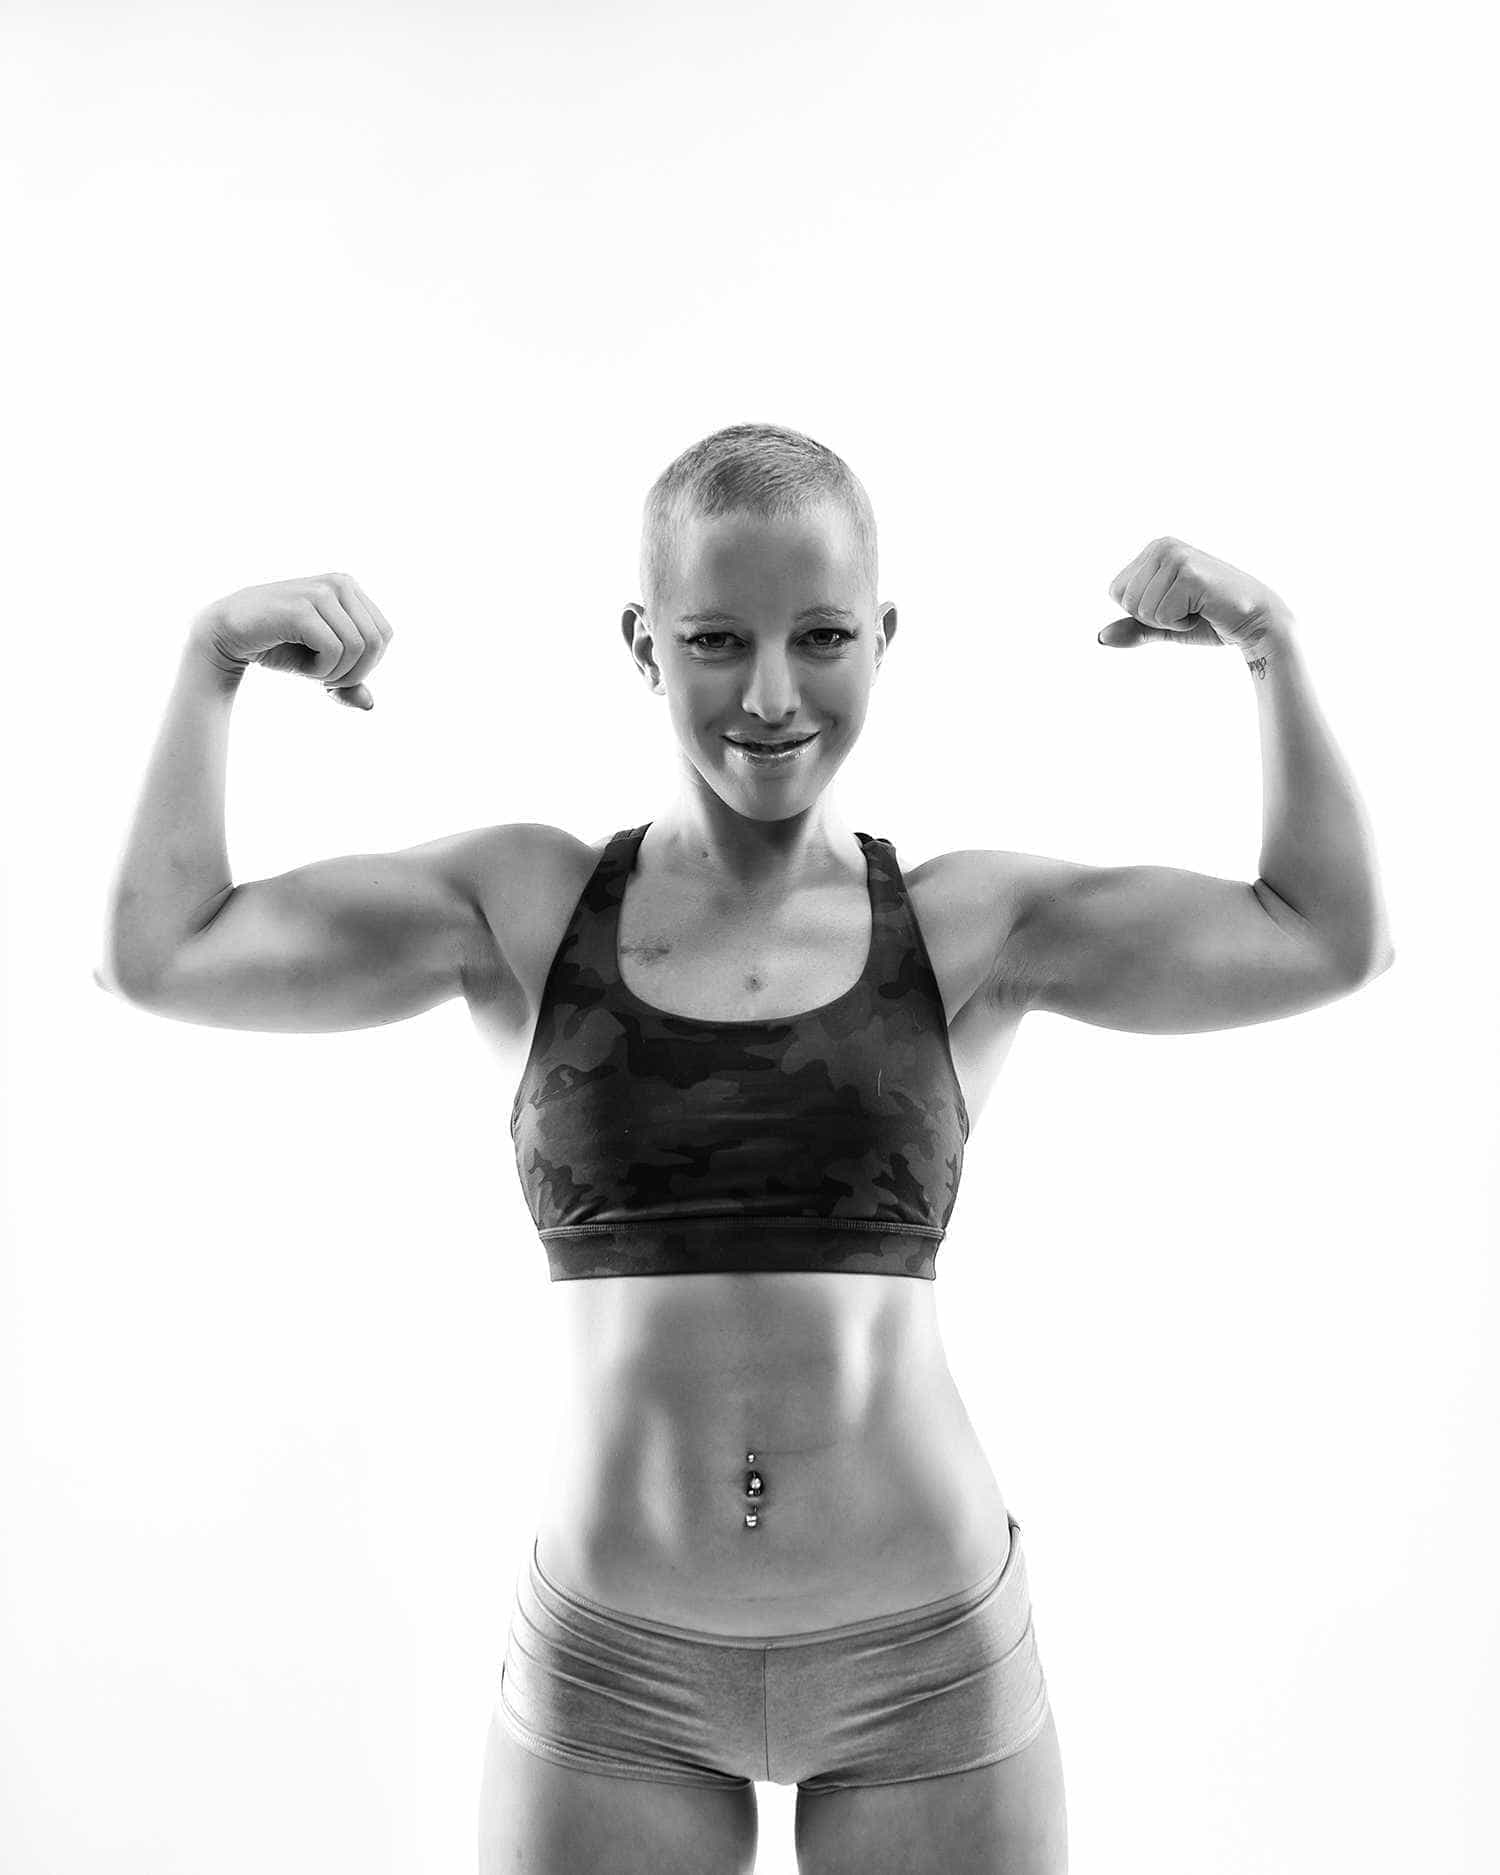 Tem cancro aos 24 anos mas luta pela vida e agarra-se ao exercício